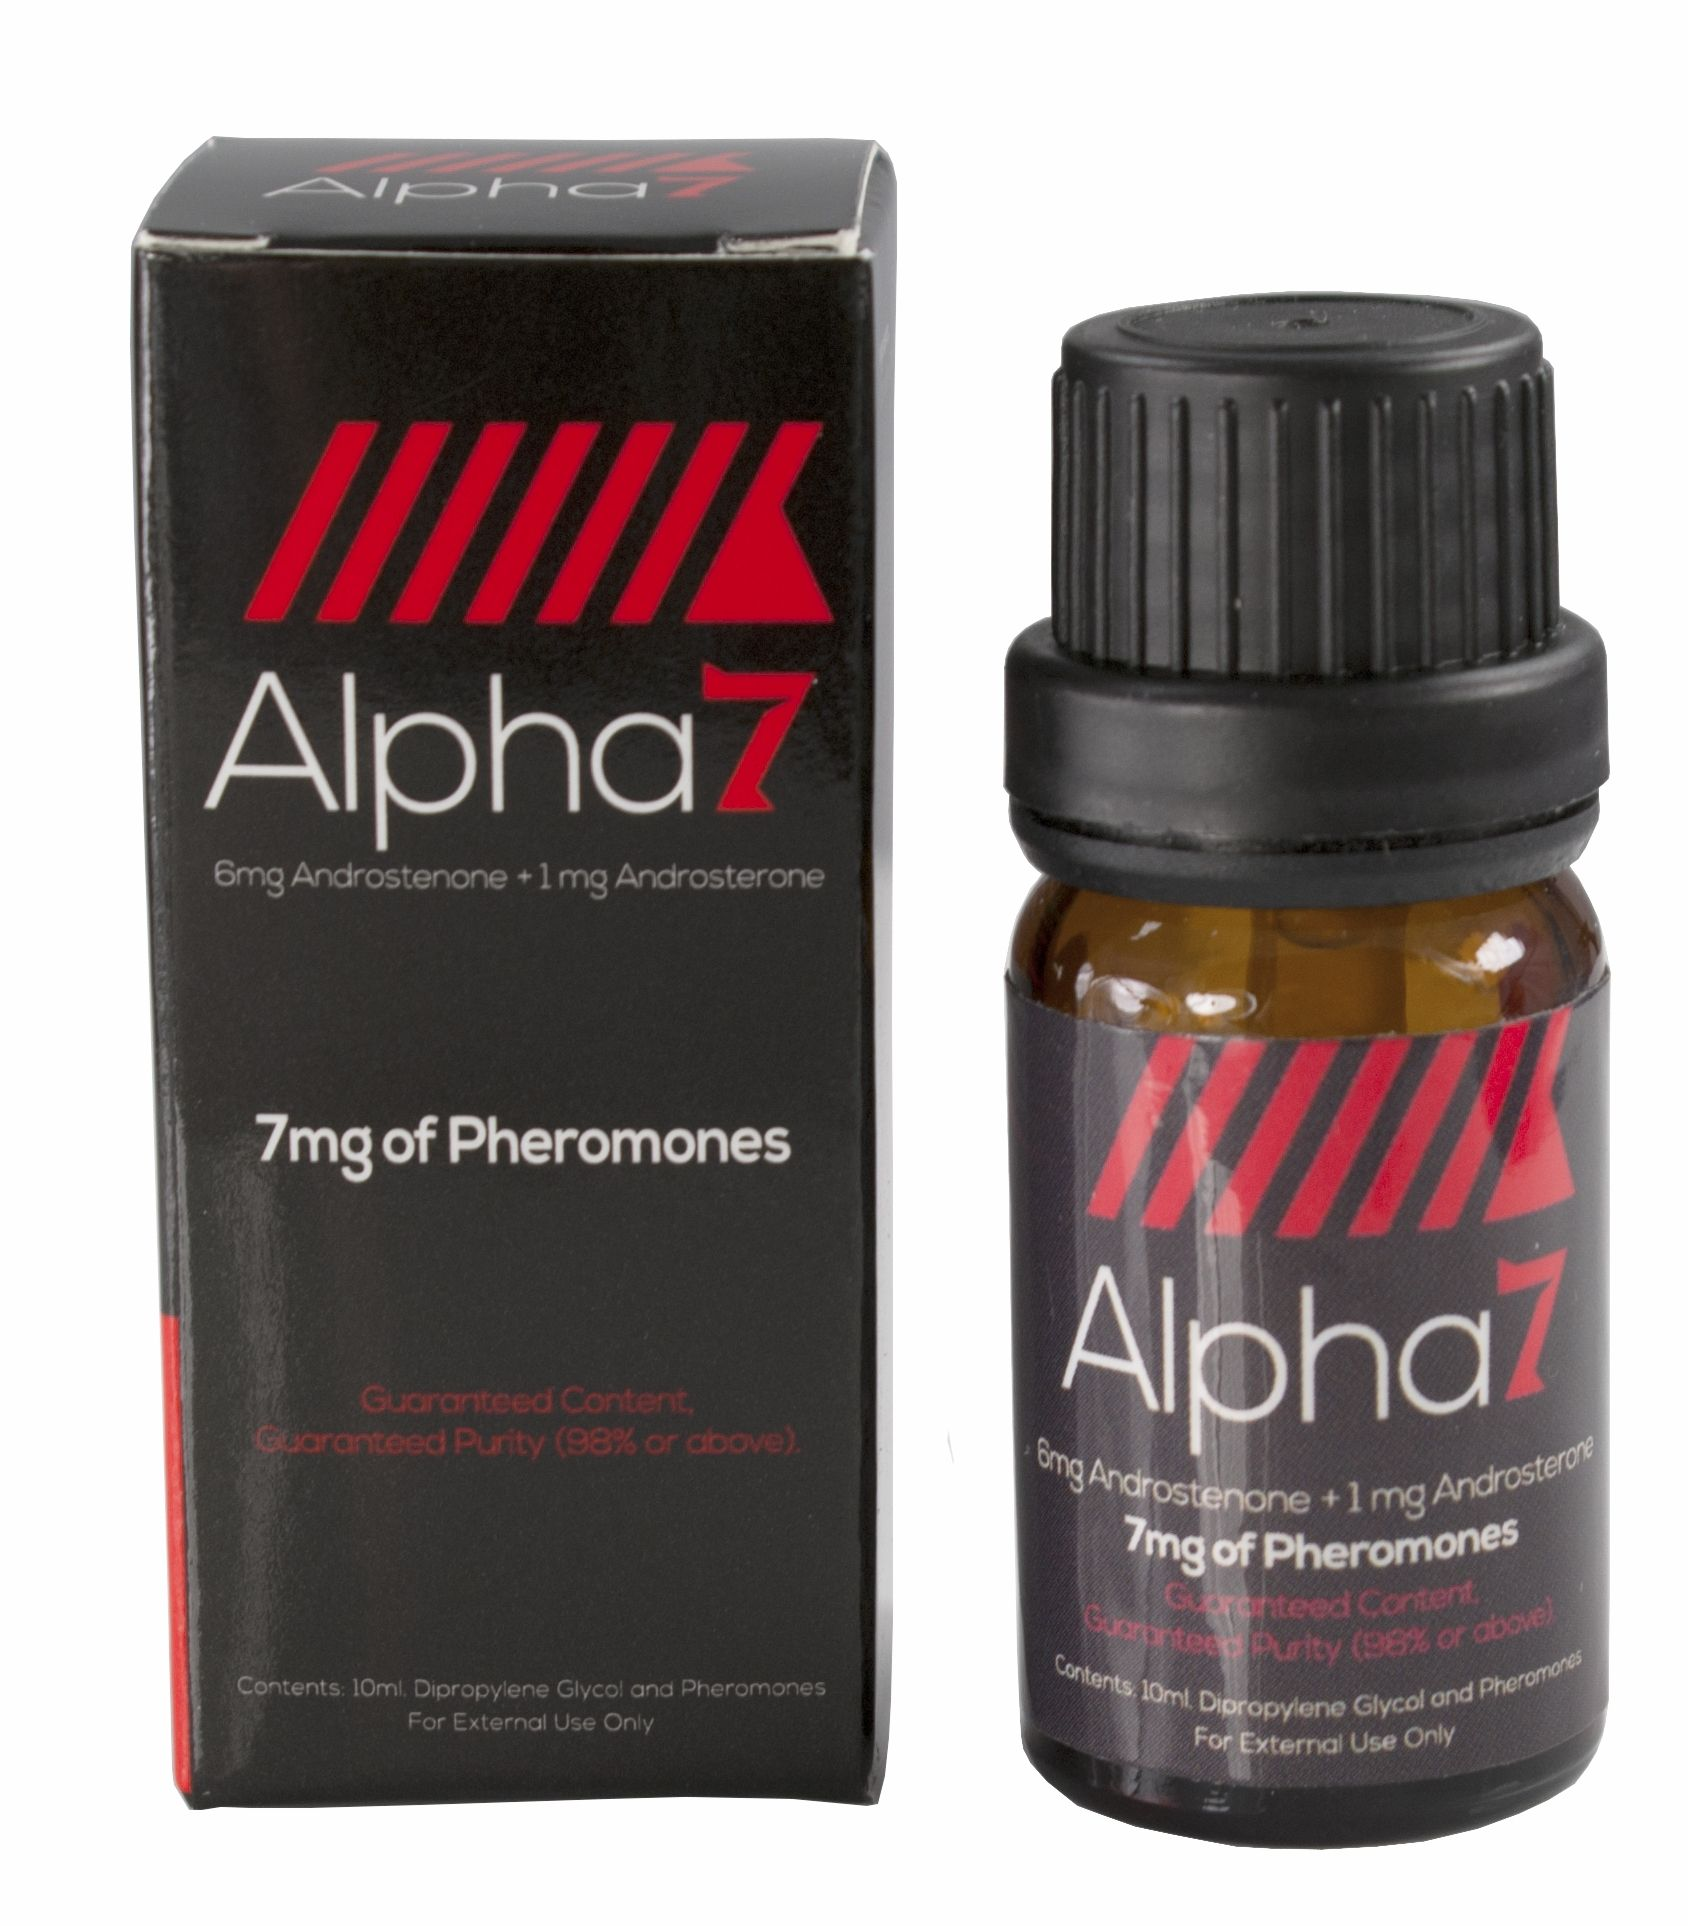 Alpha 7 Unscented Pheromones